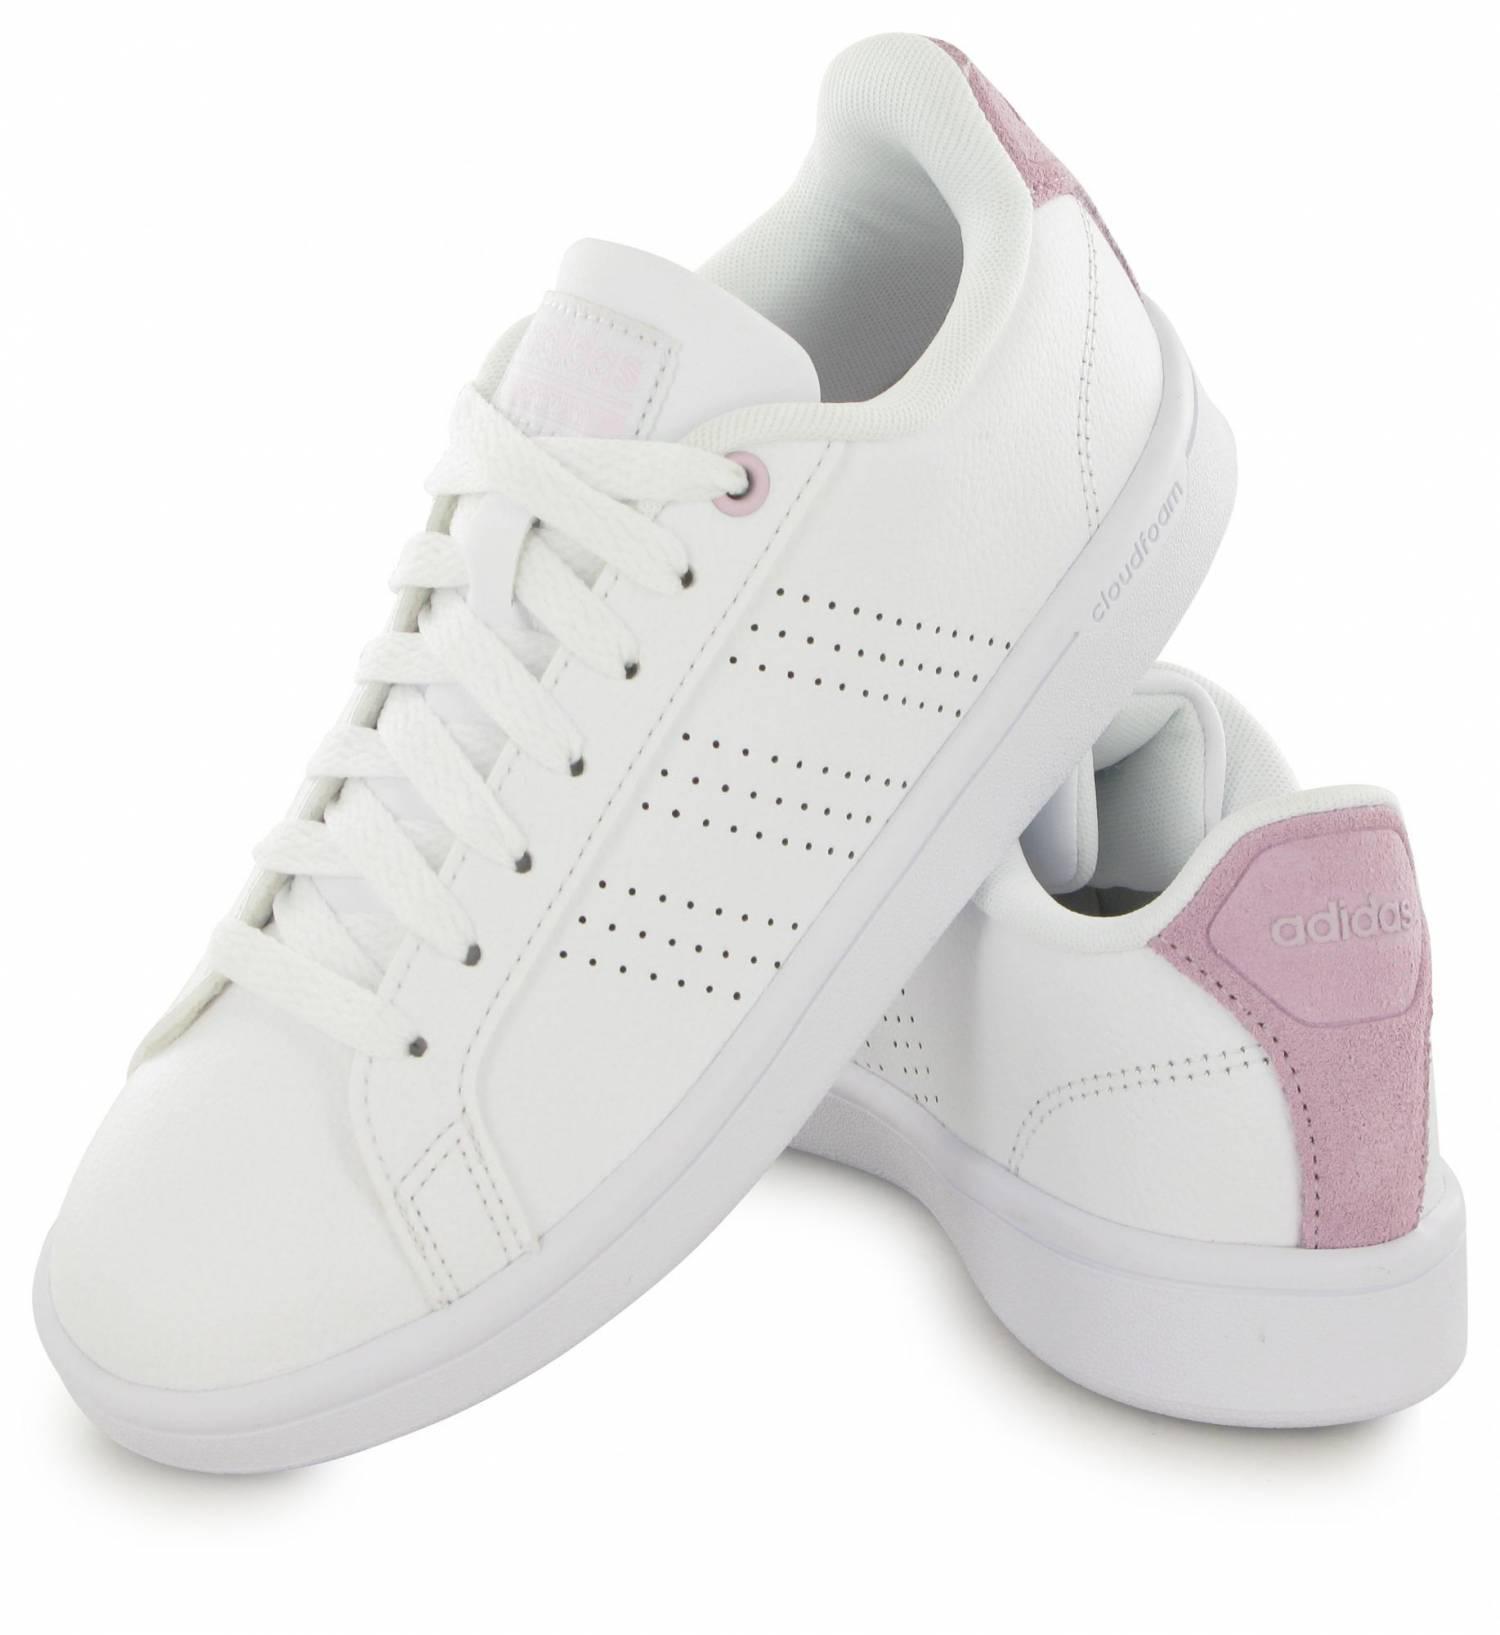 Adidas Neo Cloudfoam Advantage Clean Blanc / Rose